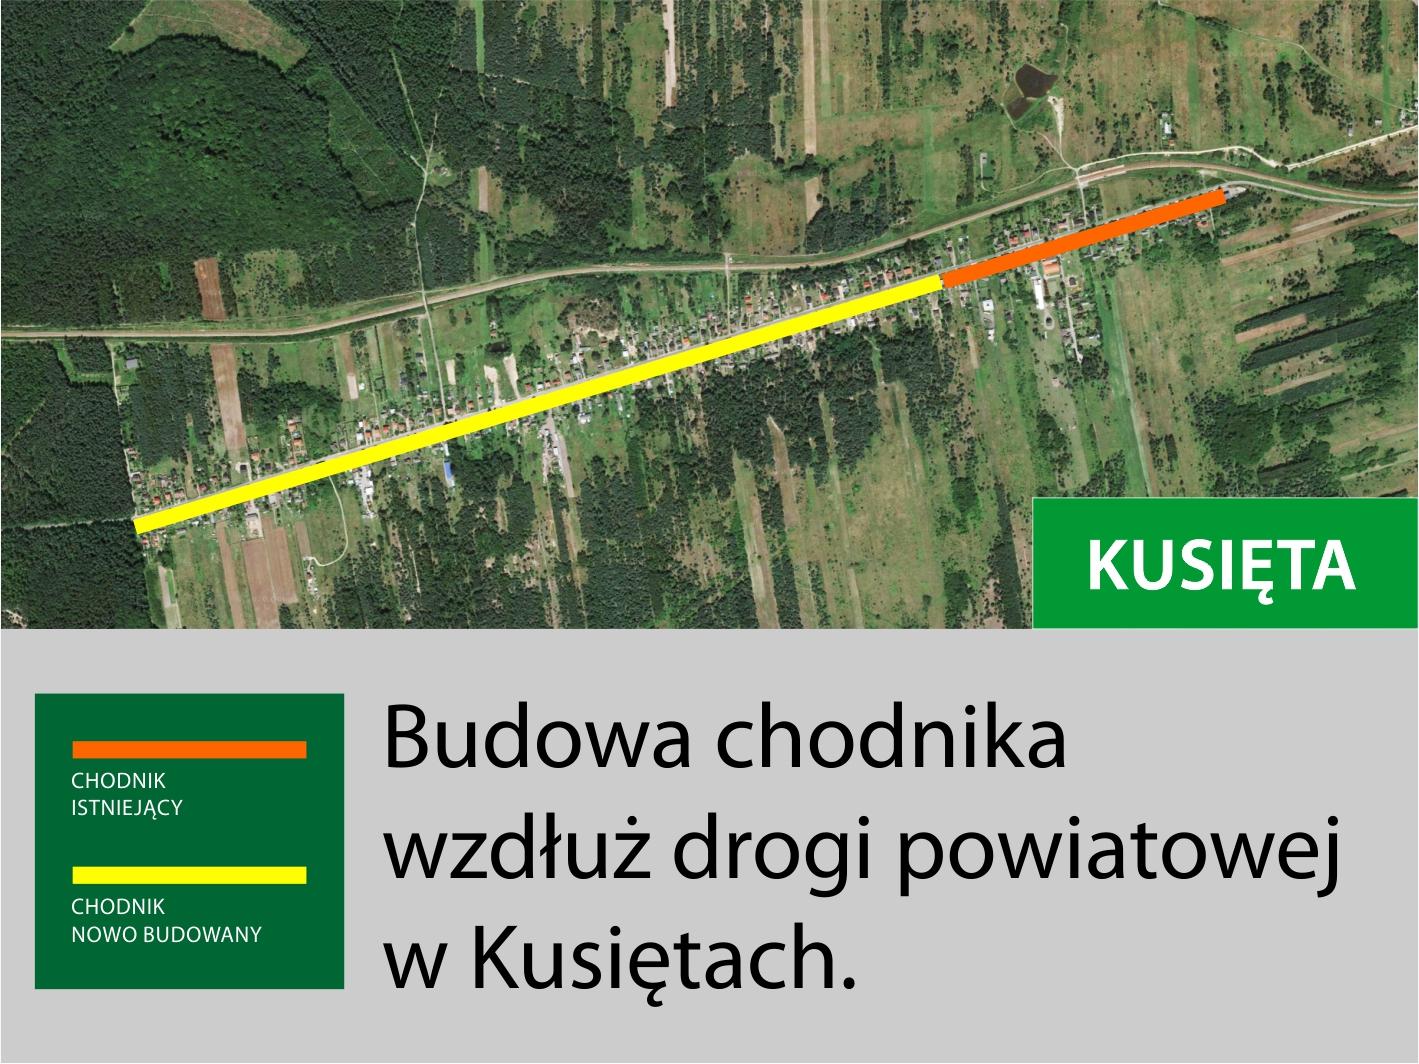 mapka Kusięta chodnik